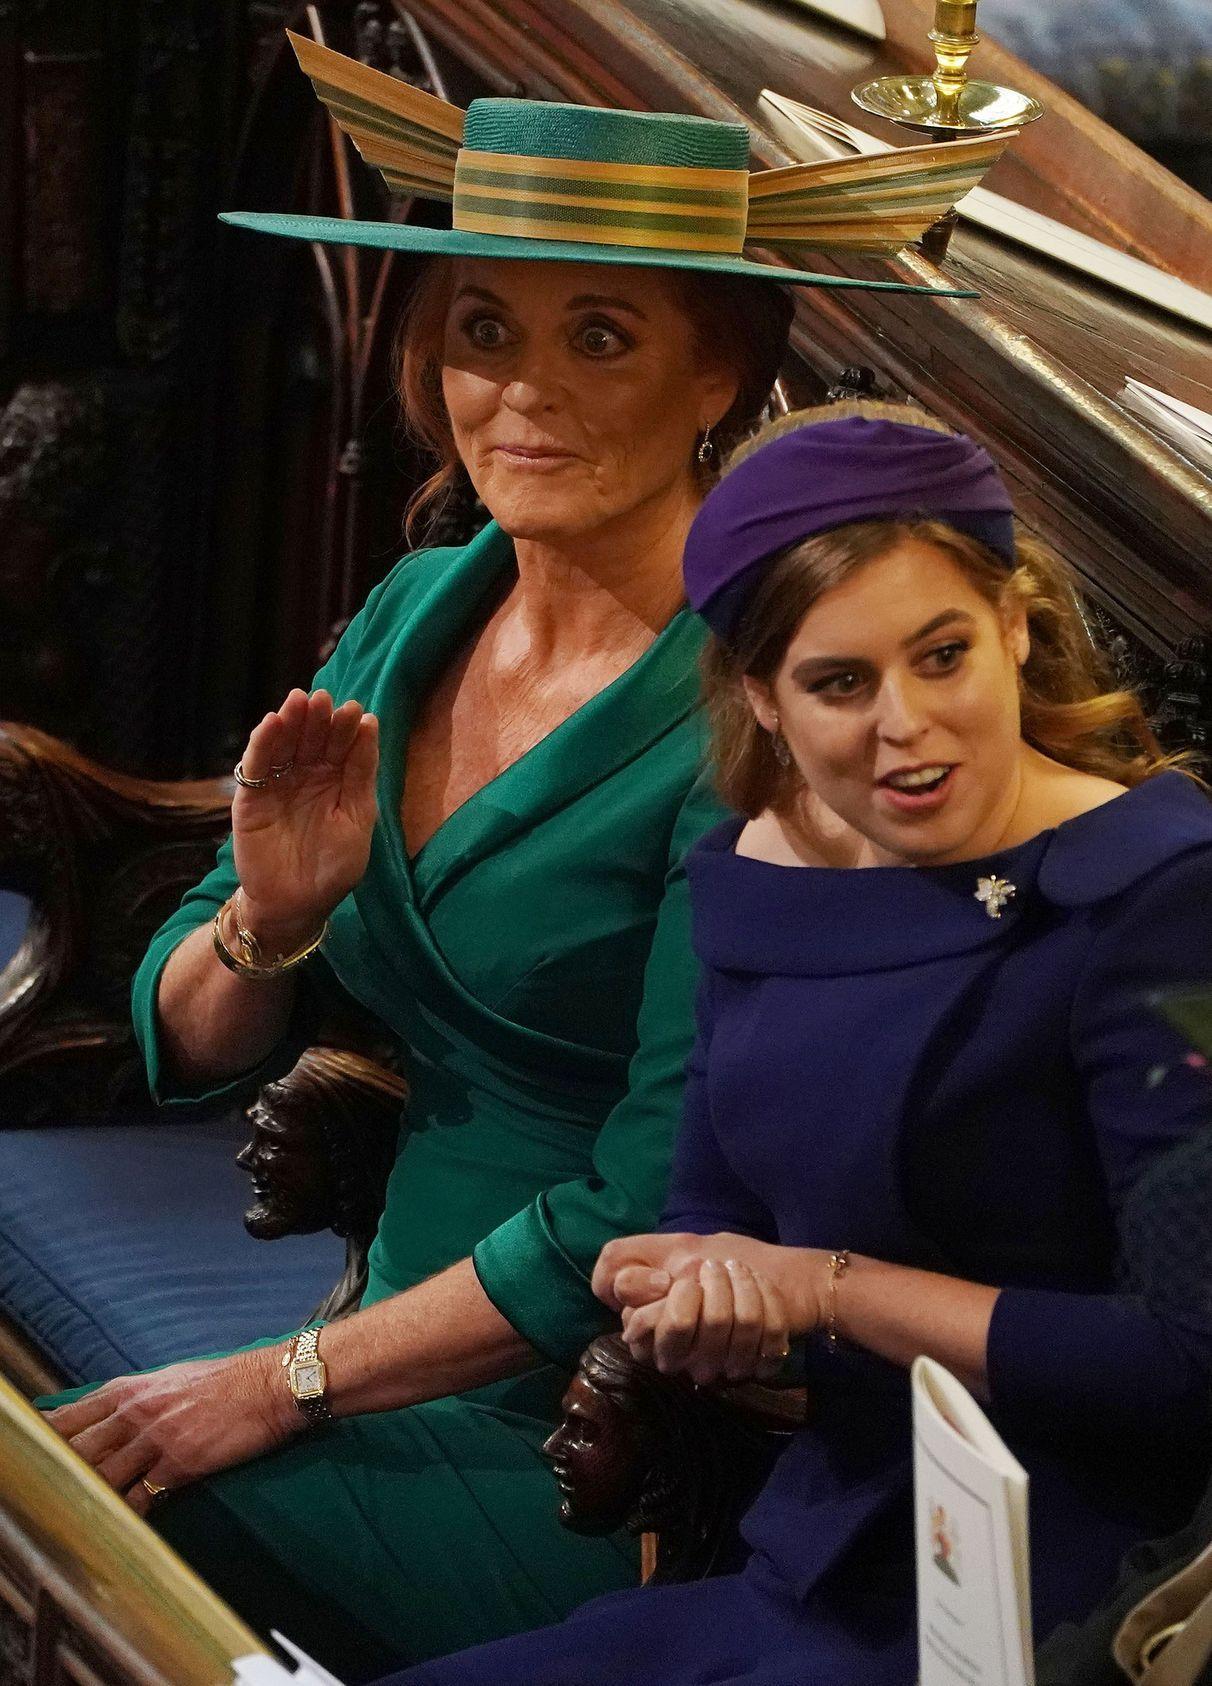 15 HILARIOUS Photos From Princess Eugenie's Wedding You